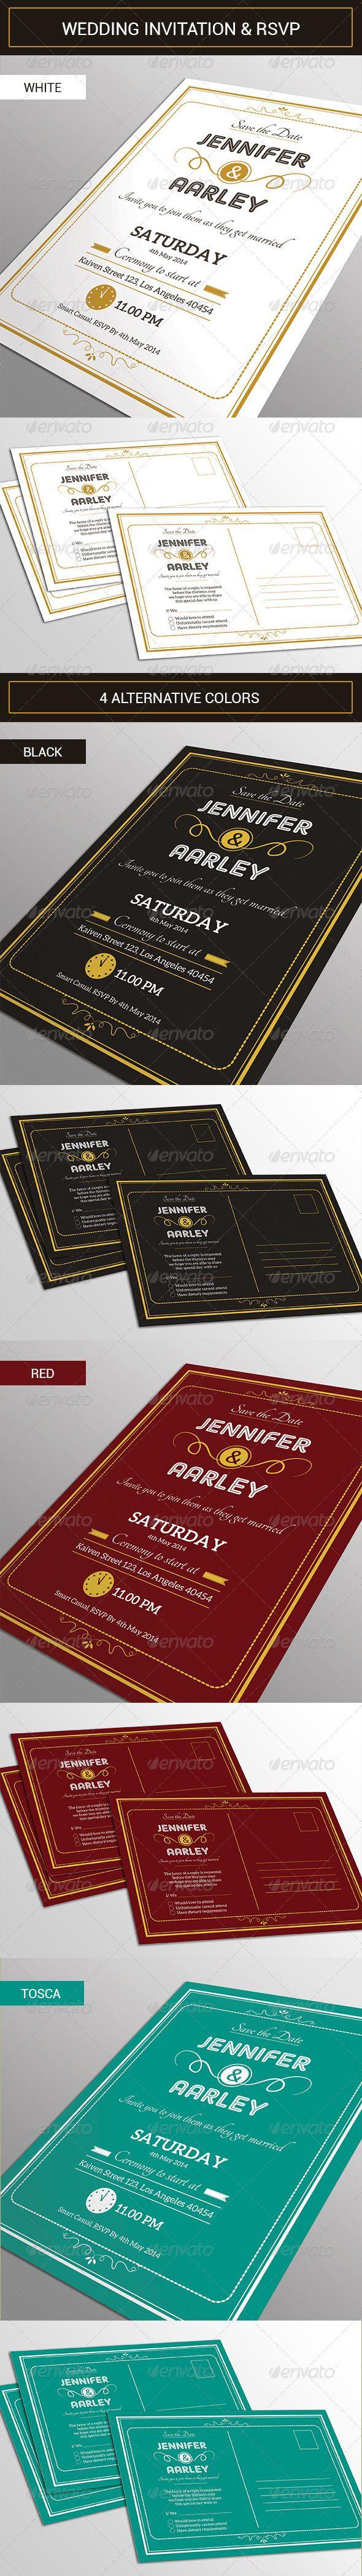 141 best Wedding Template images on Pinterest | Font logo, Photoshop ...